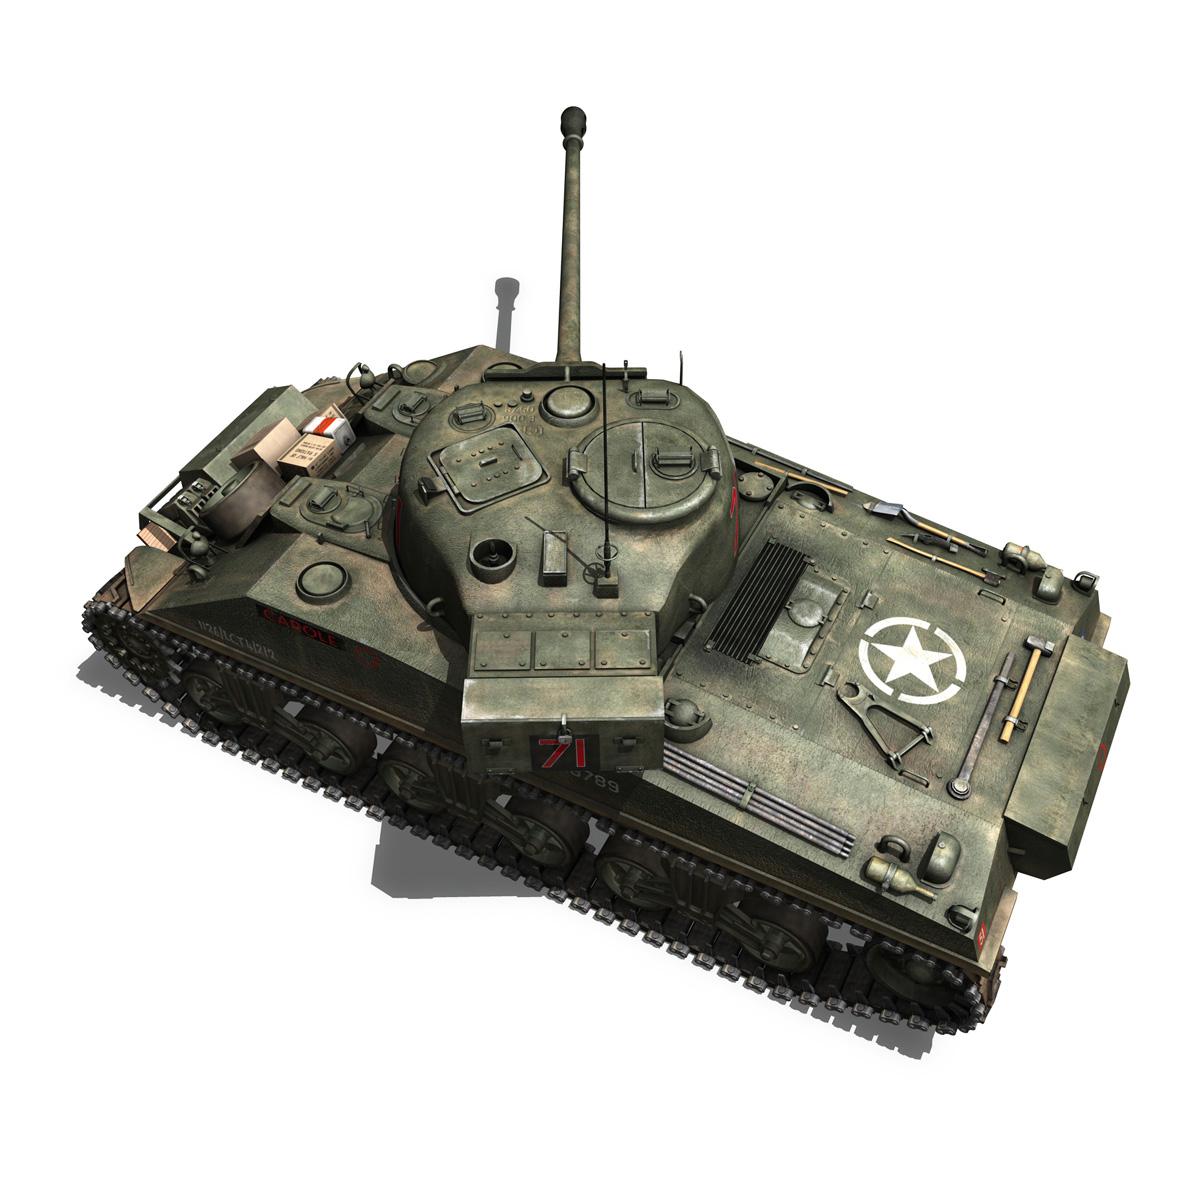 sherman mk vc firefly - karols 3d modelis 3ds fbx c4d lwo obj 267434